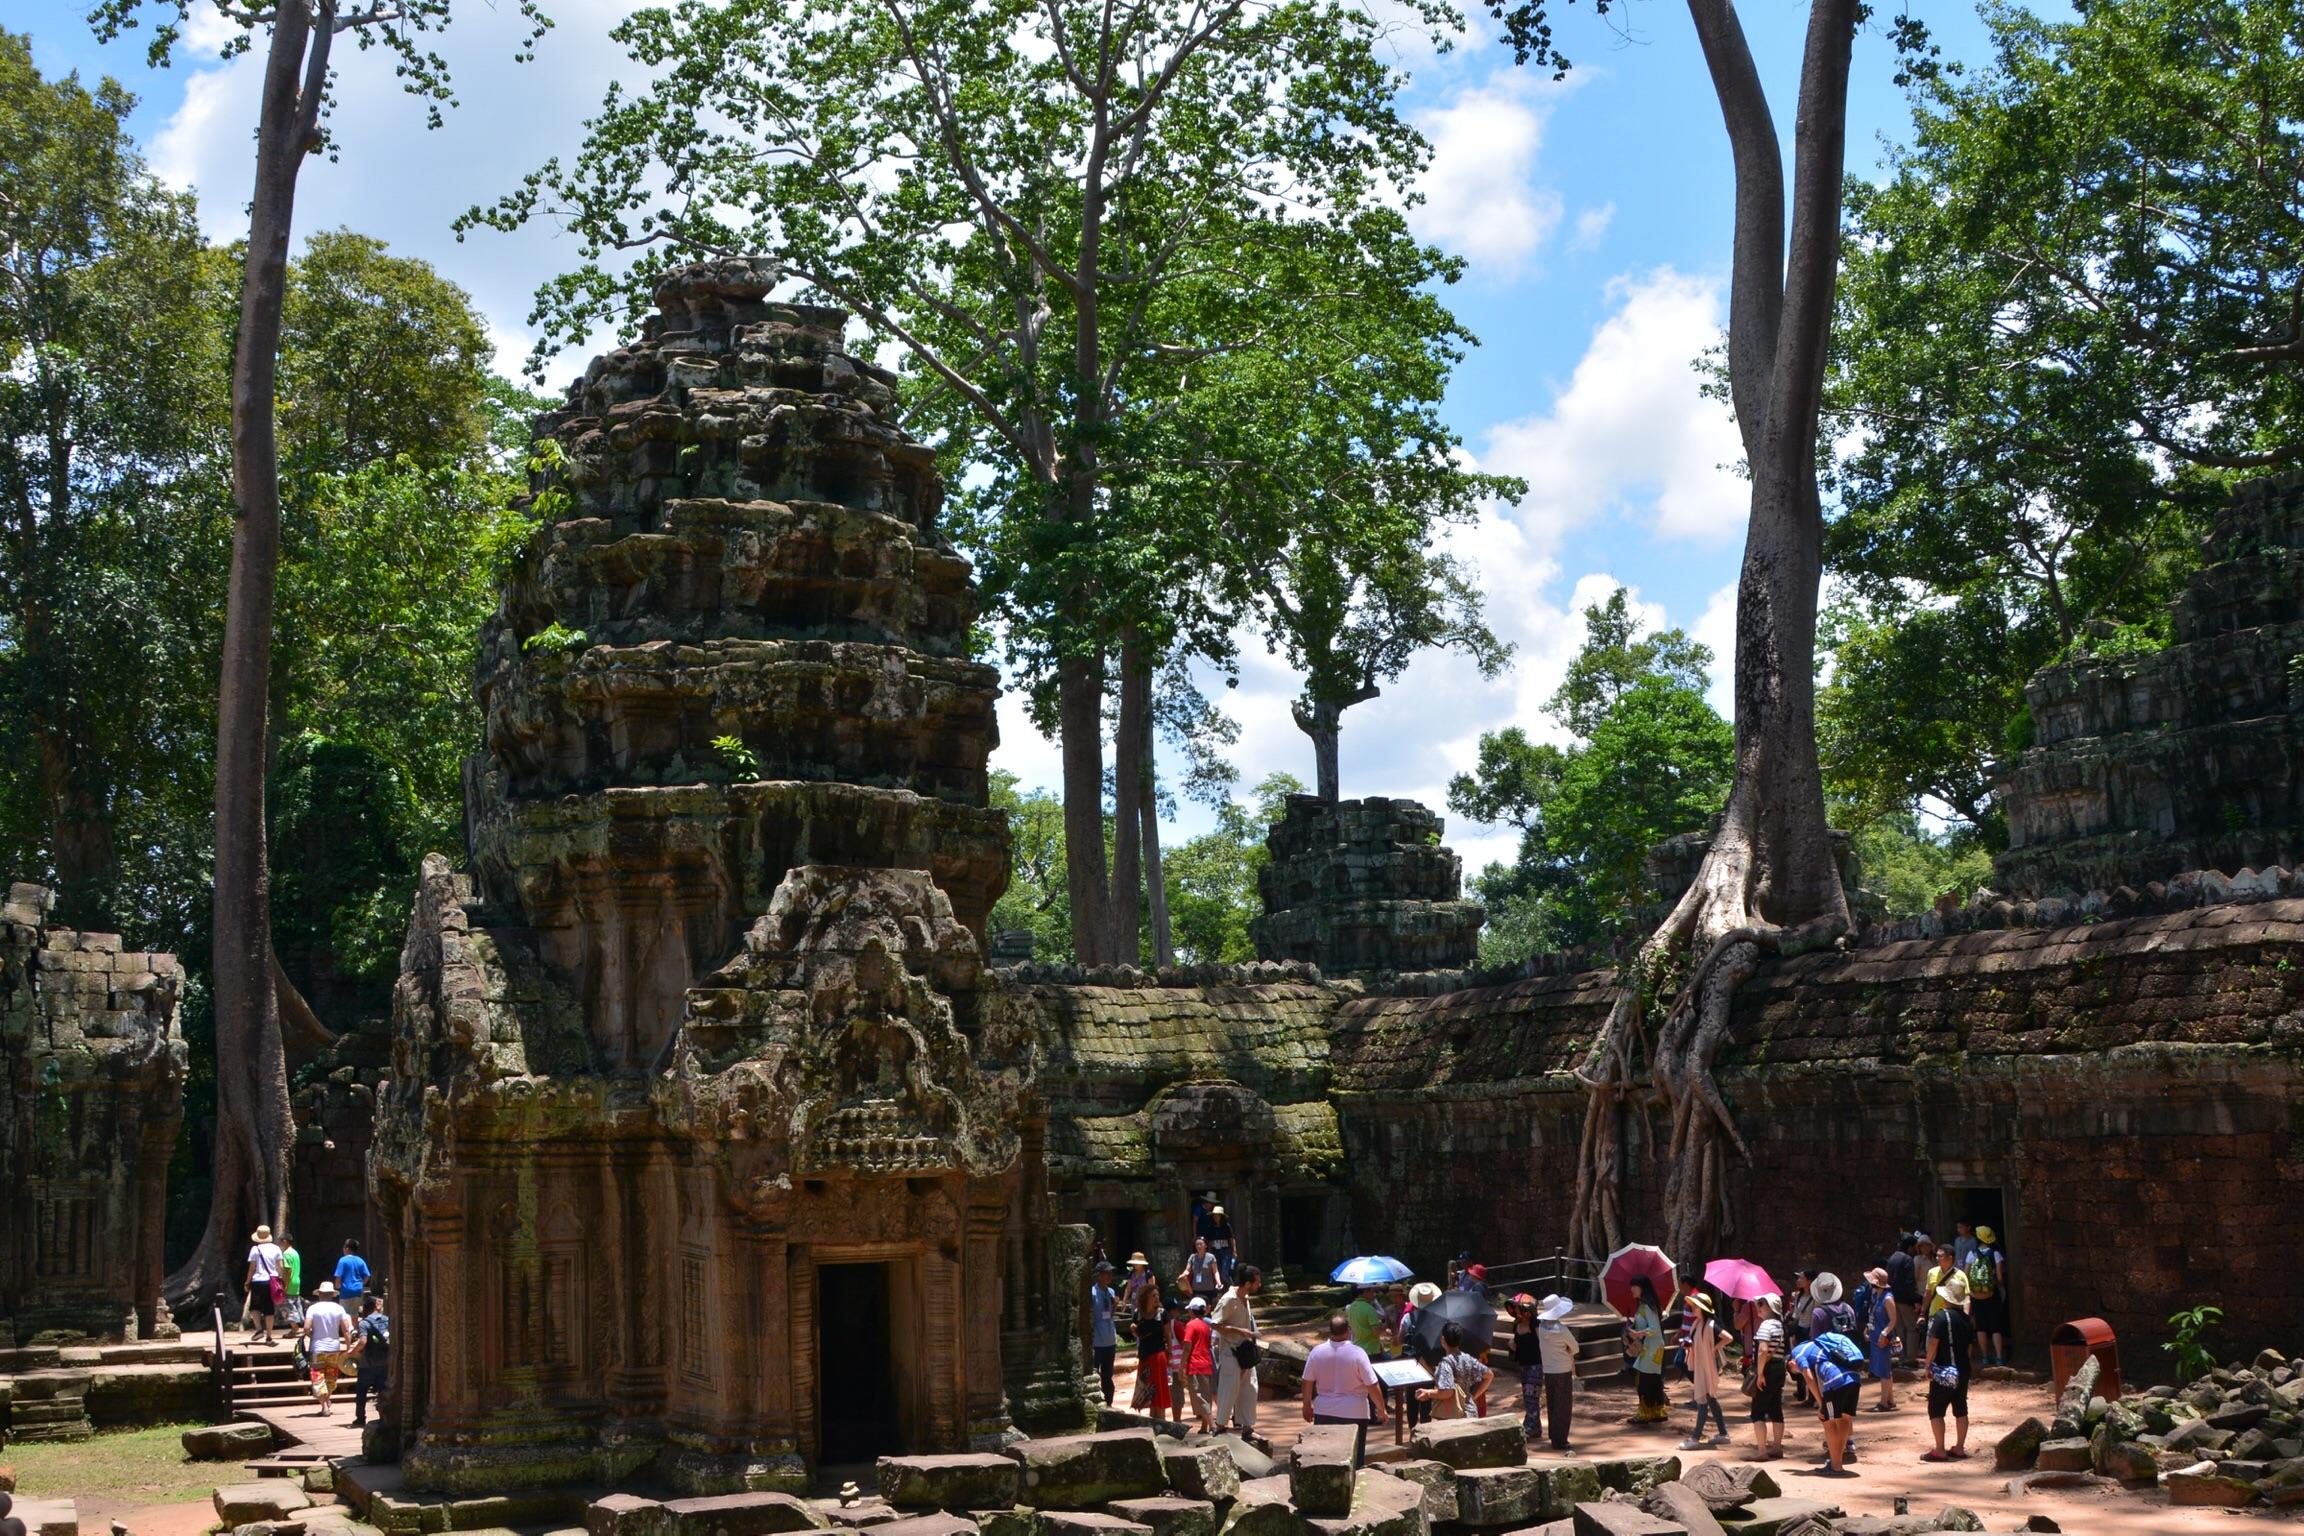 Jungle-clad ruins of Ta Prohm (from Tomb Raider movie)